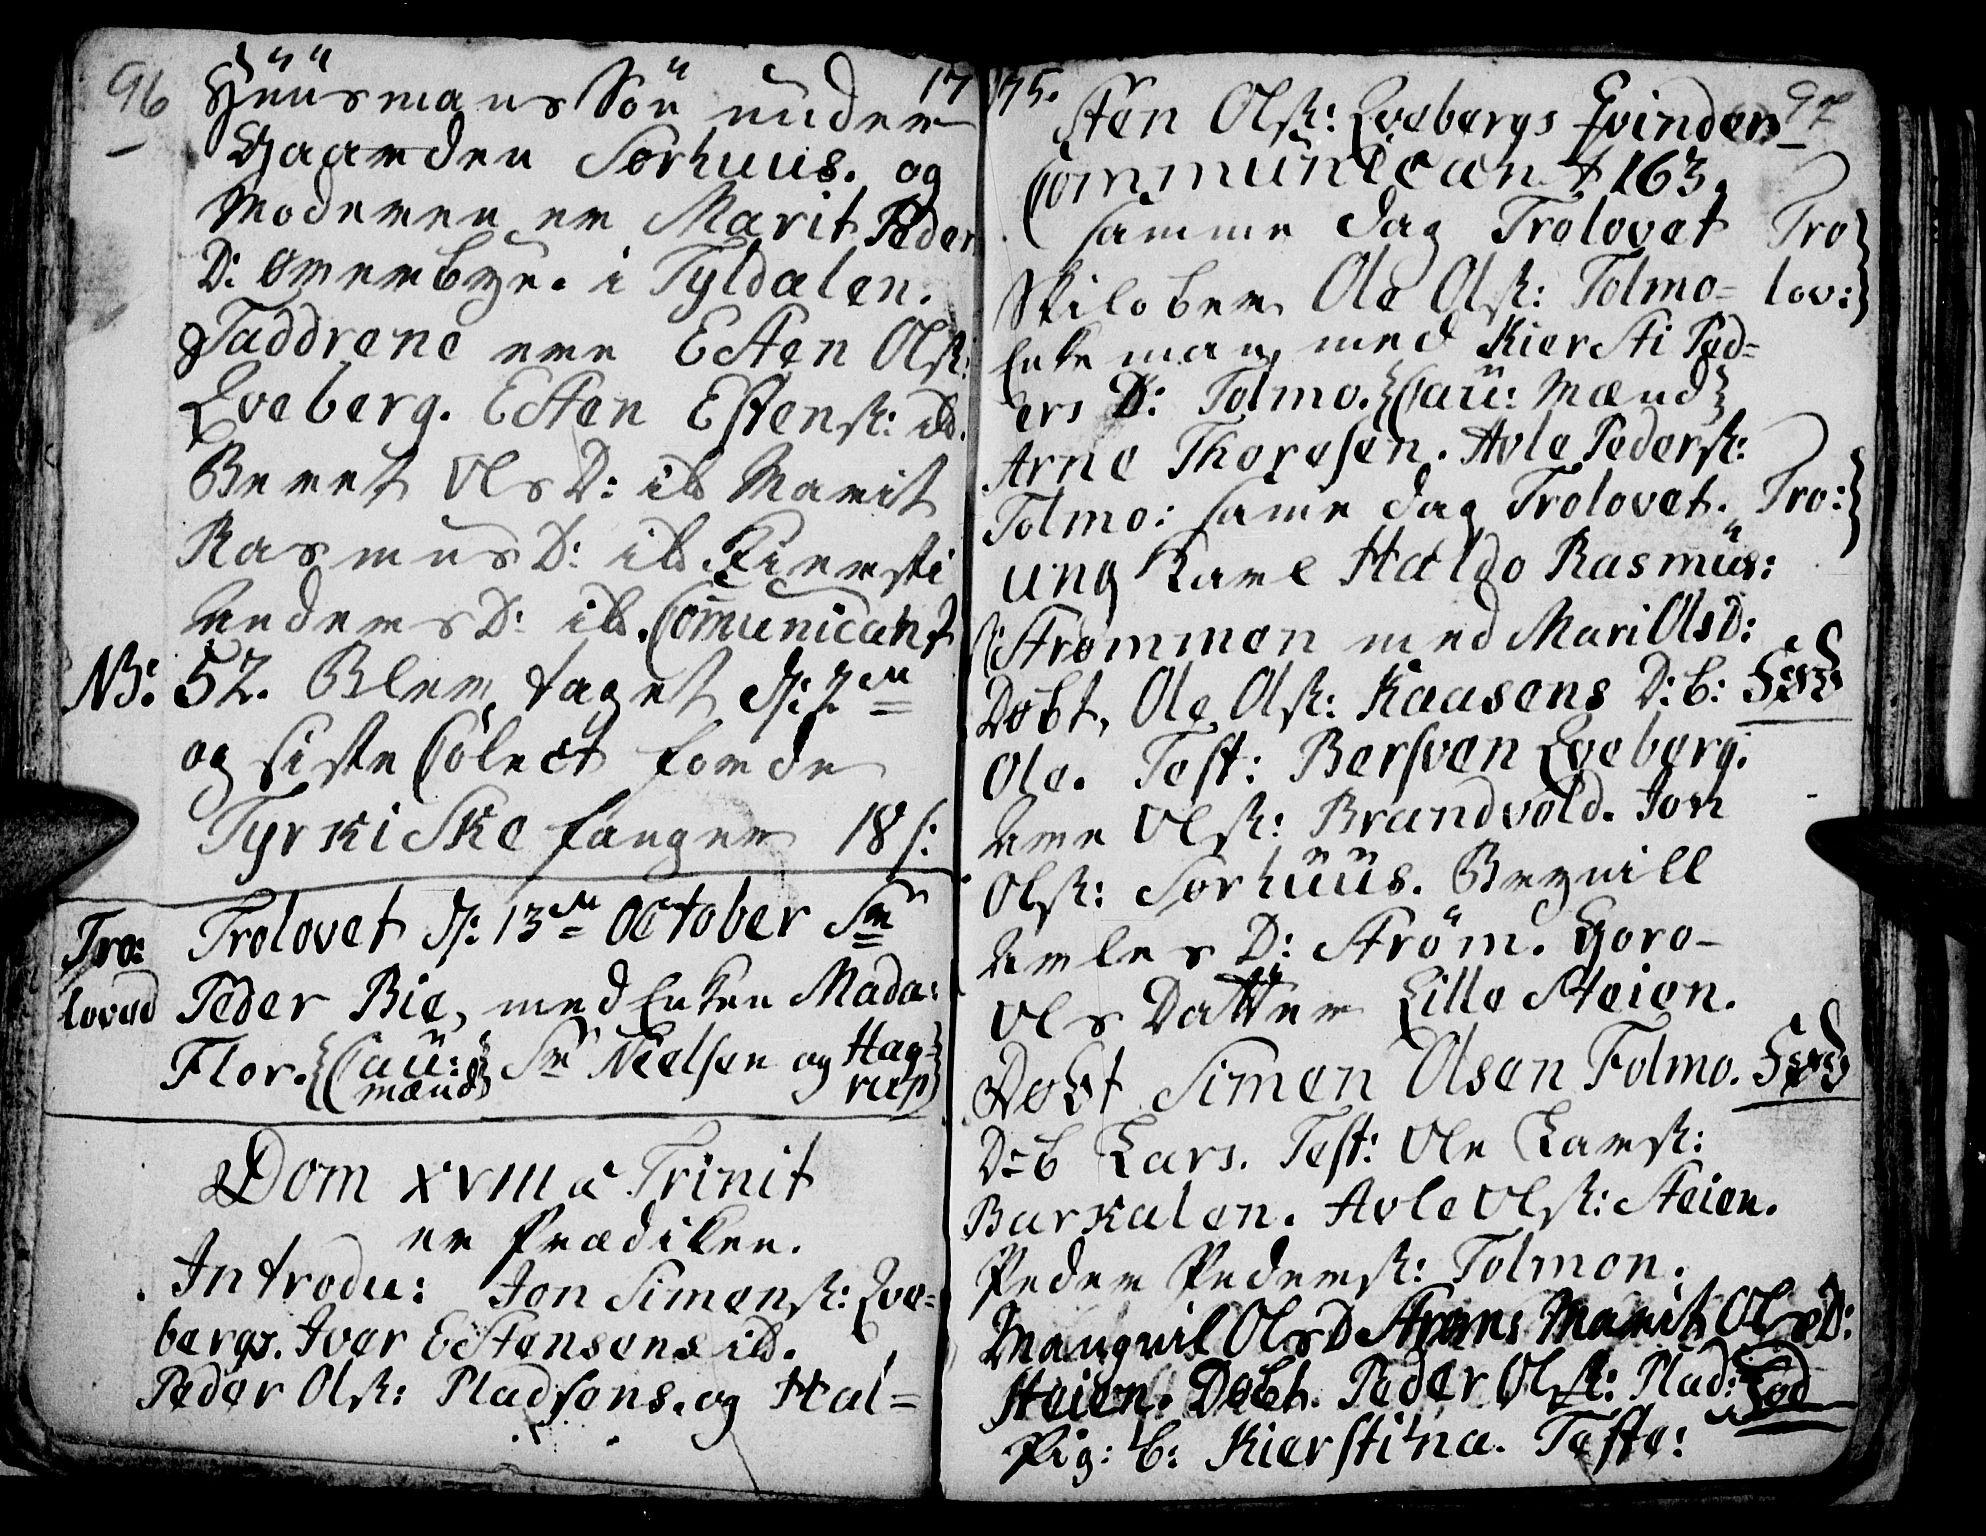 SAH, Tynset prestekontor, Ministerialbok nr. 9, 1769-1781, s. 96-97